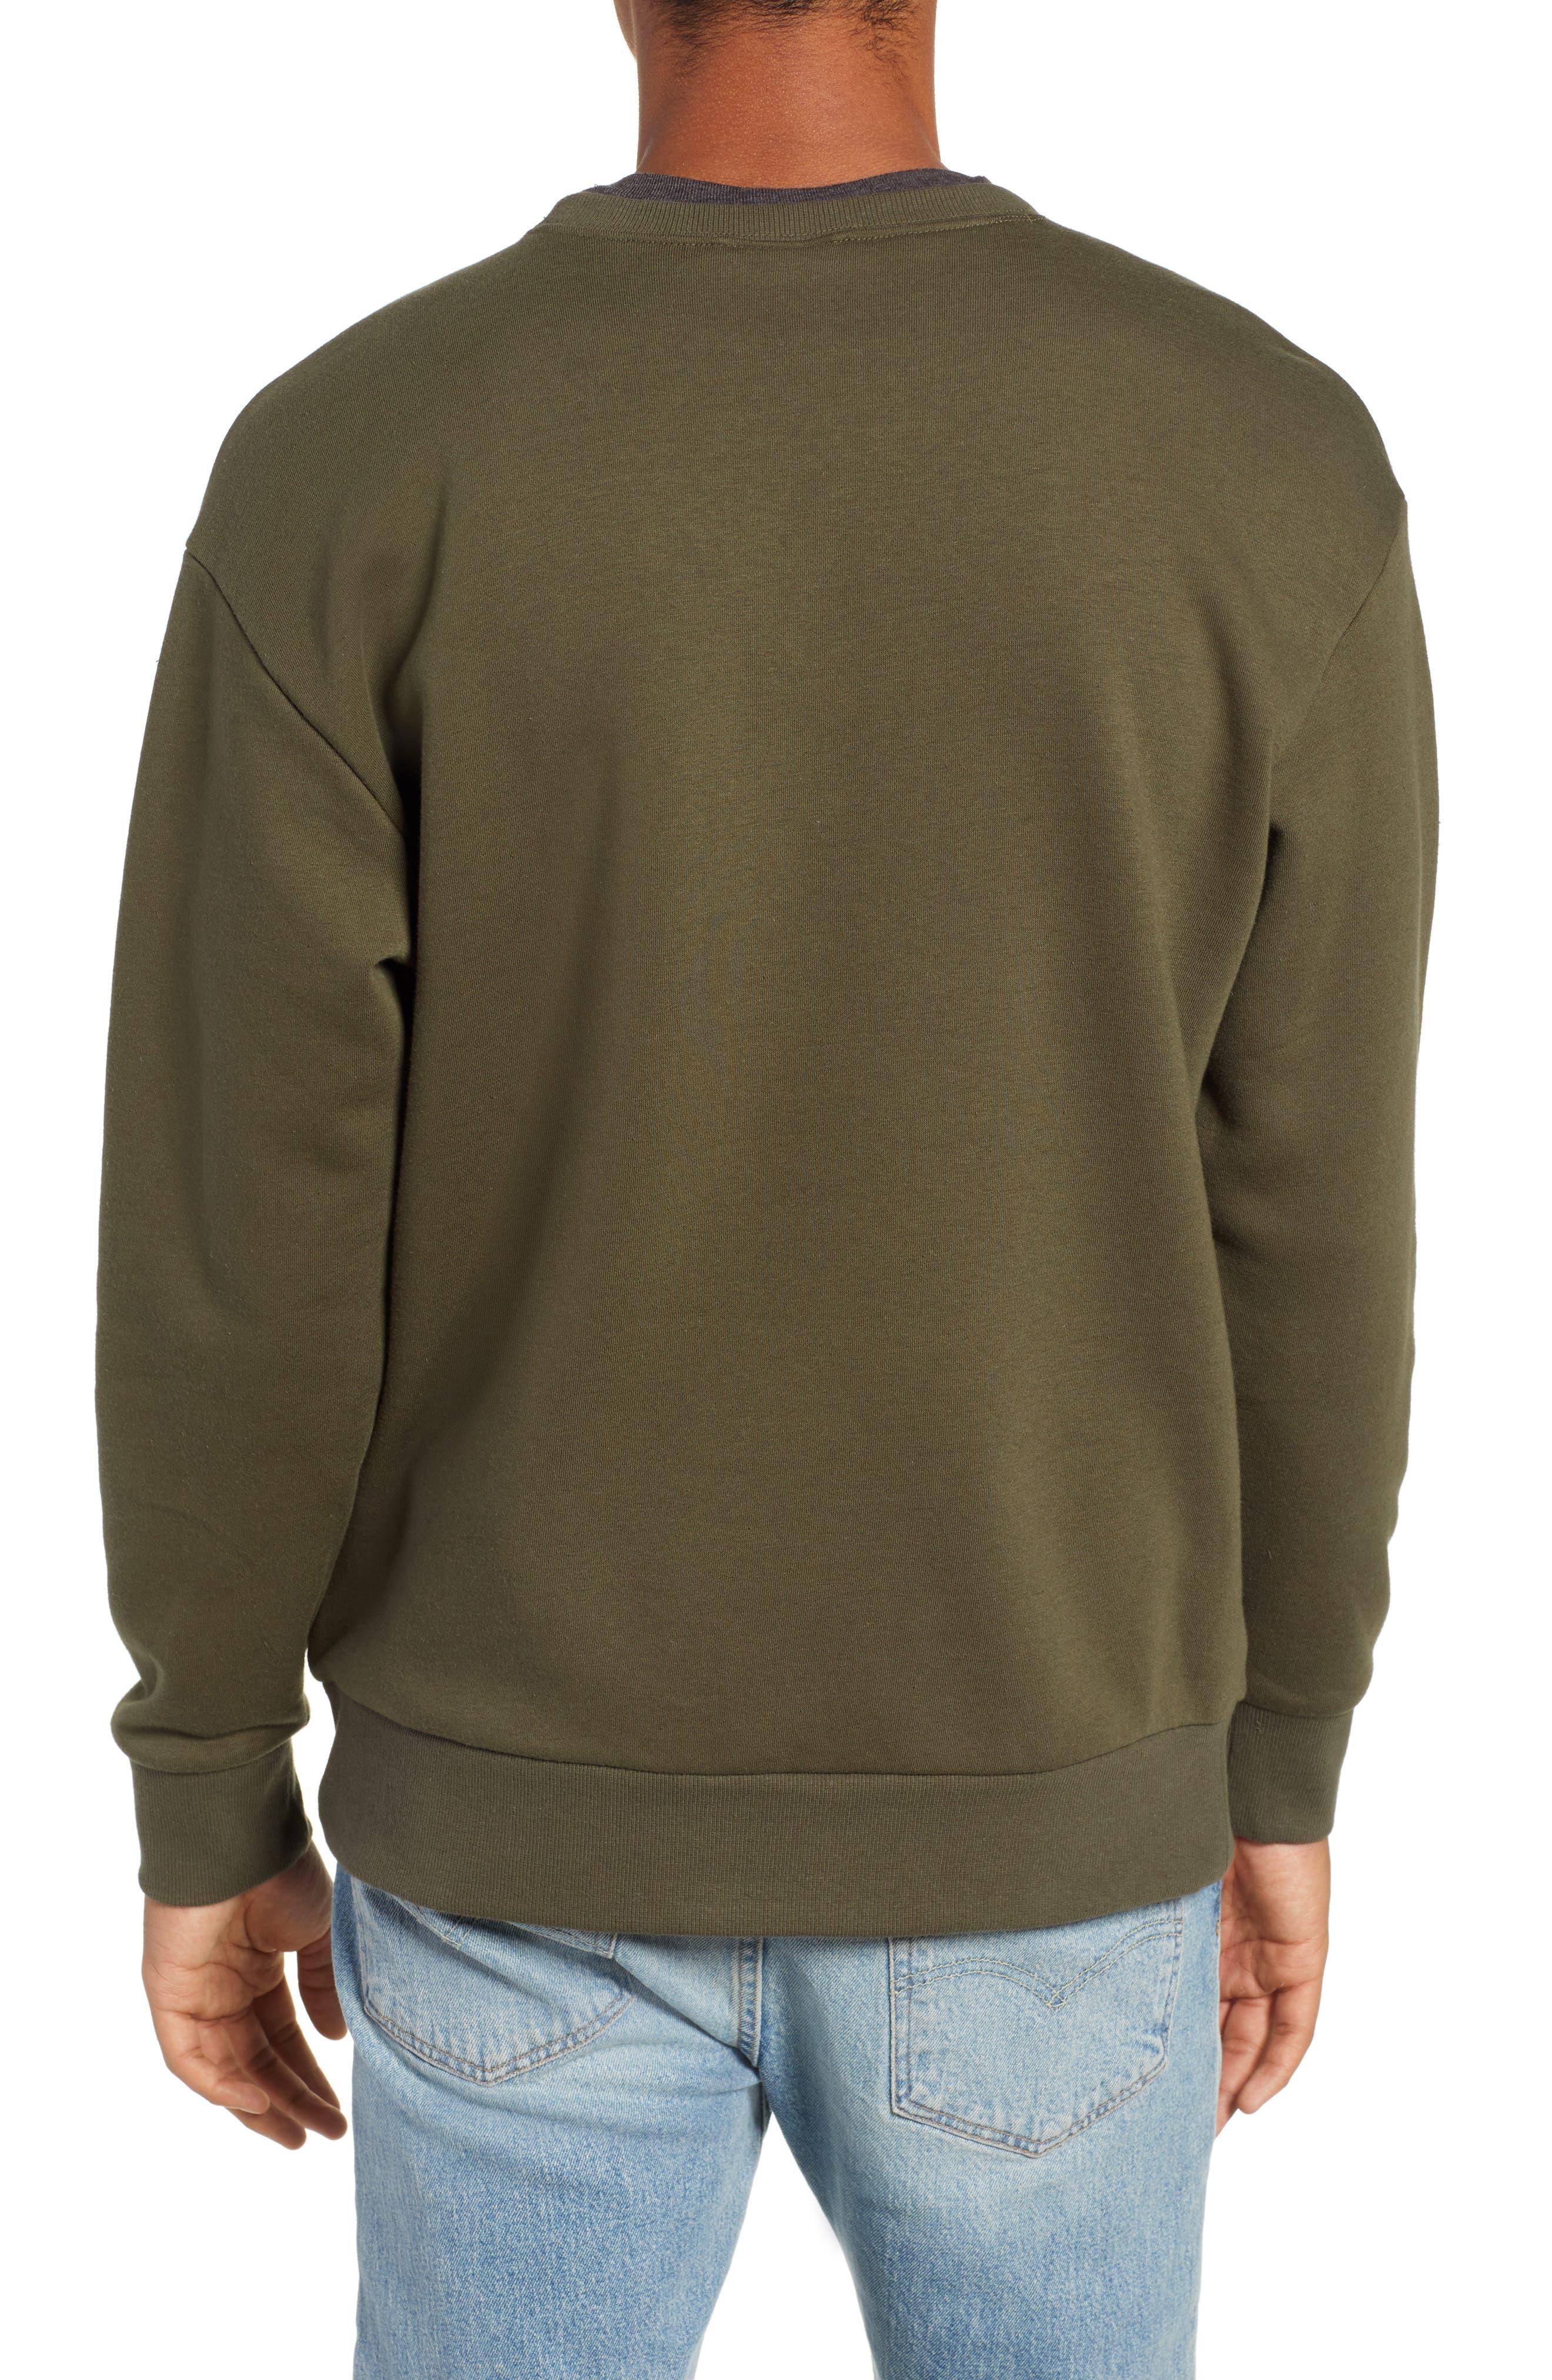 Bugasweat Crewneck Sweatshirt,                             Alternate thumbnail 2, color,                             PEATMOSS